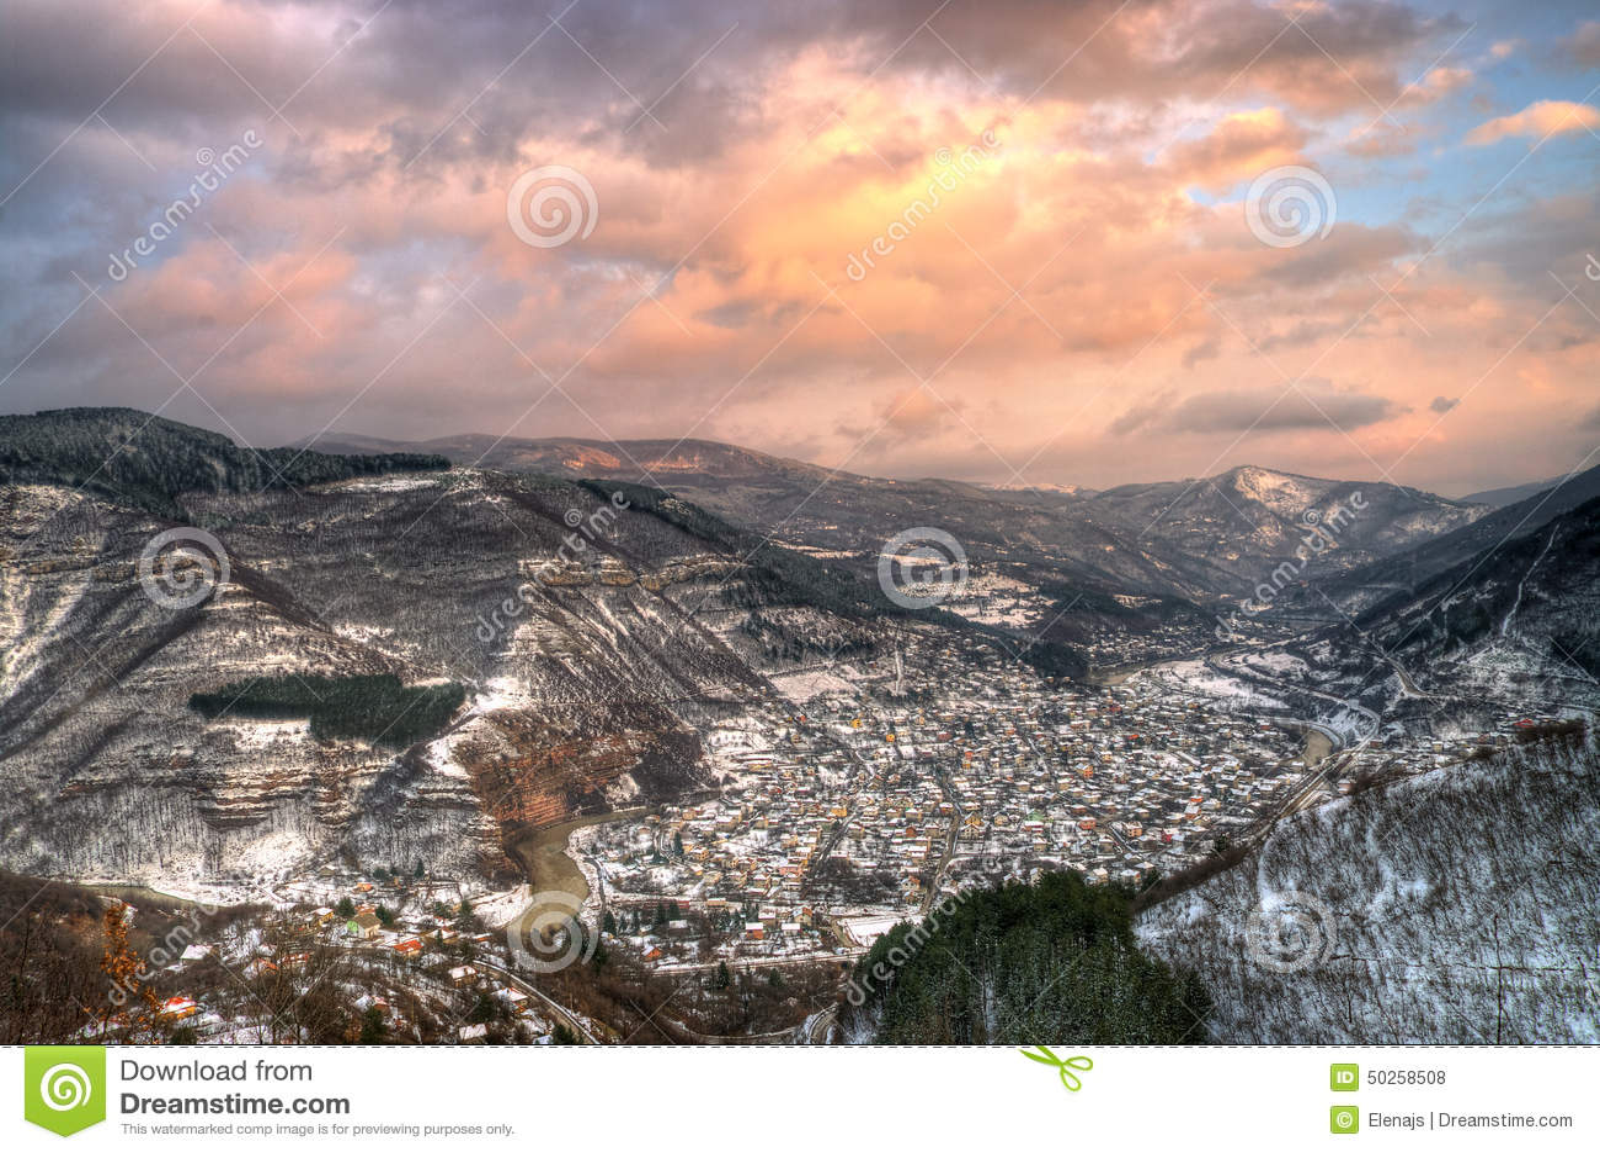 Winter picture with sunset near Tserovo, Bulgaria